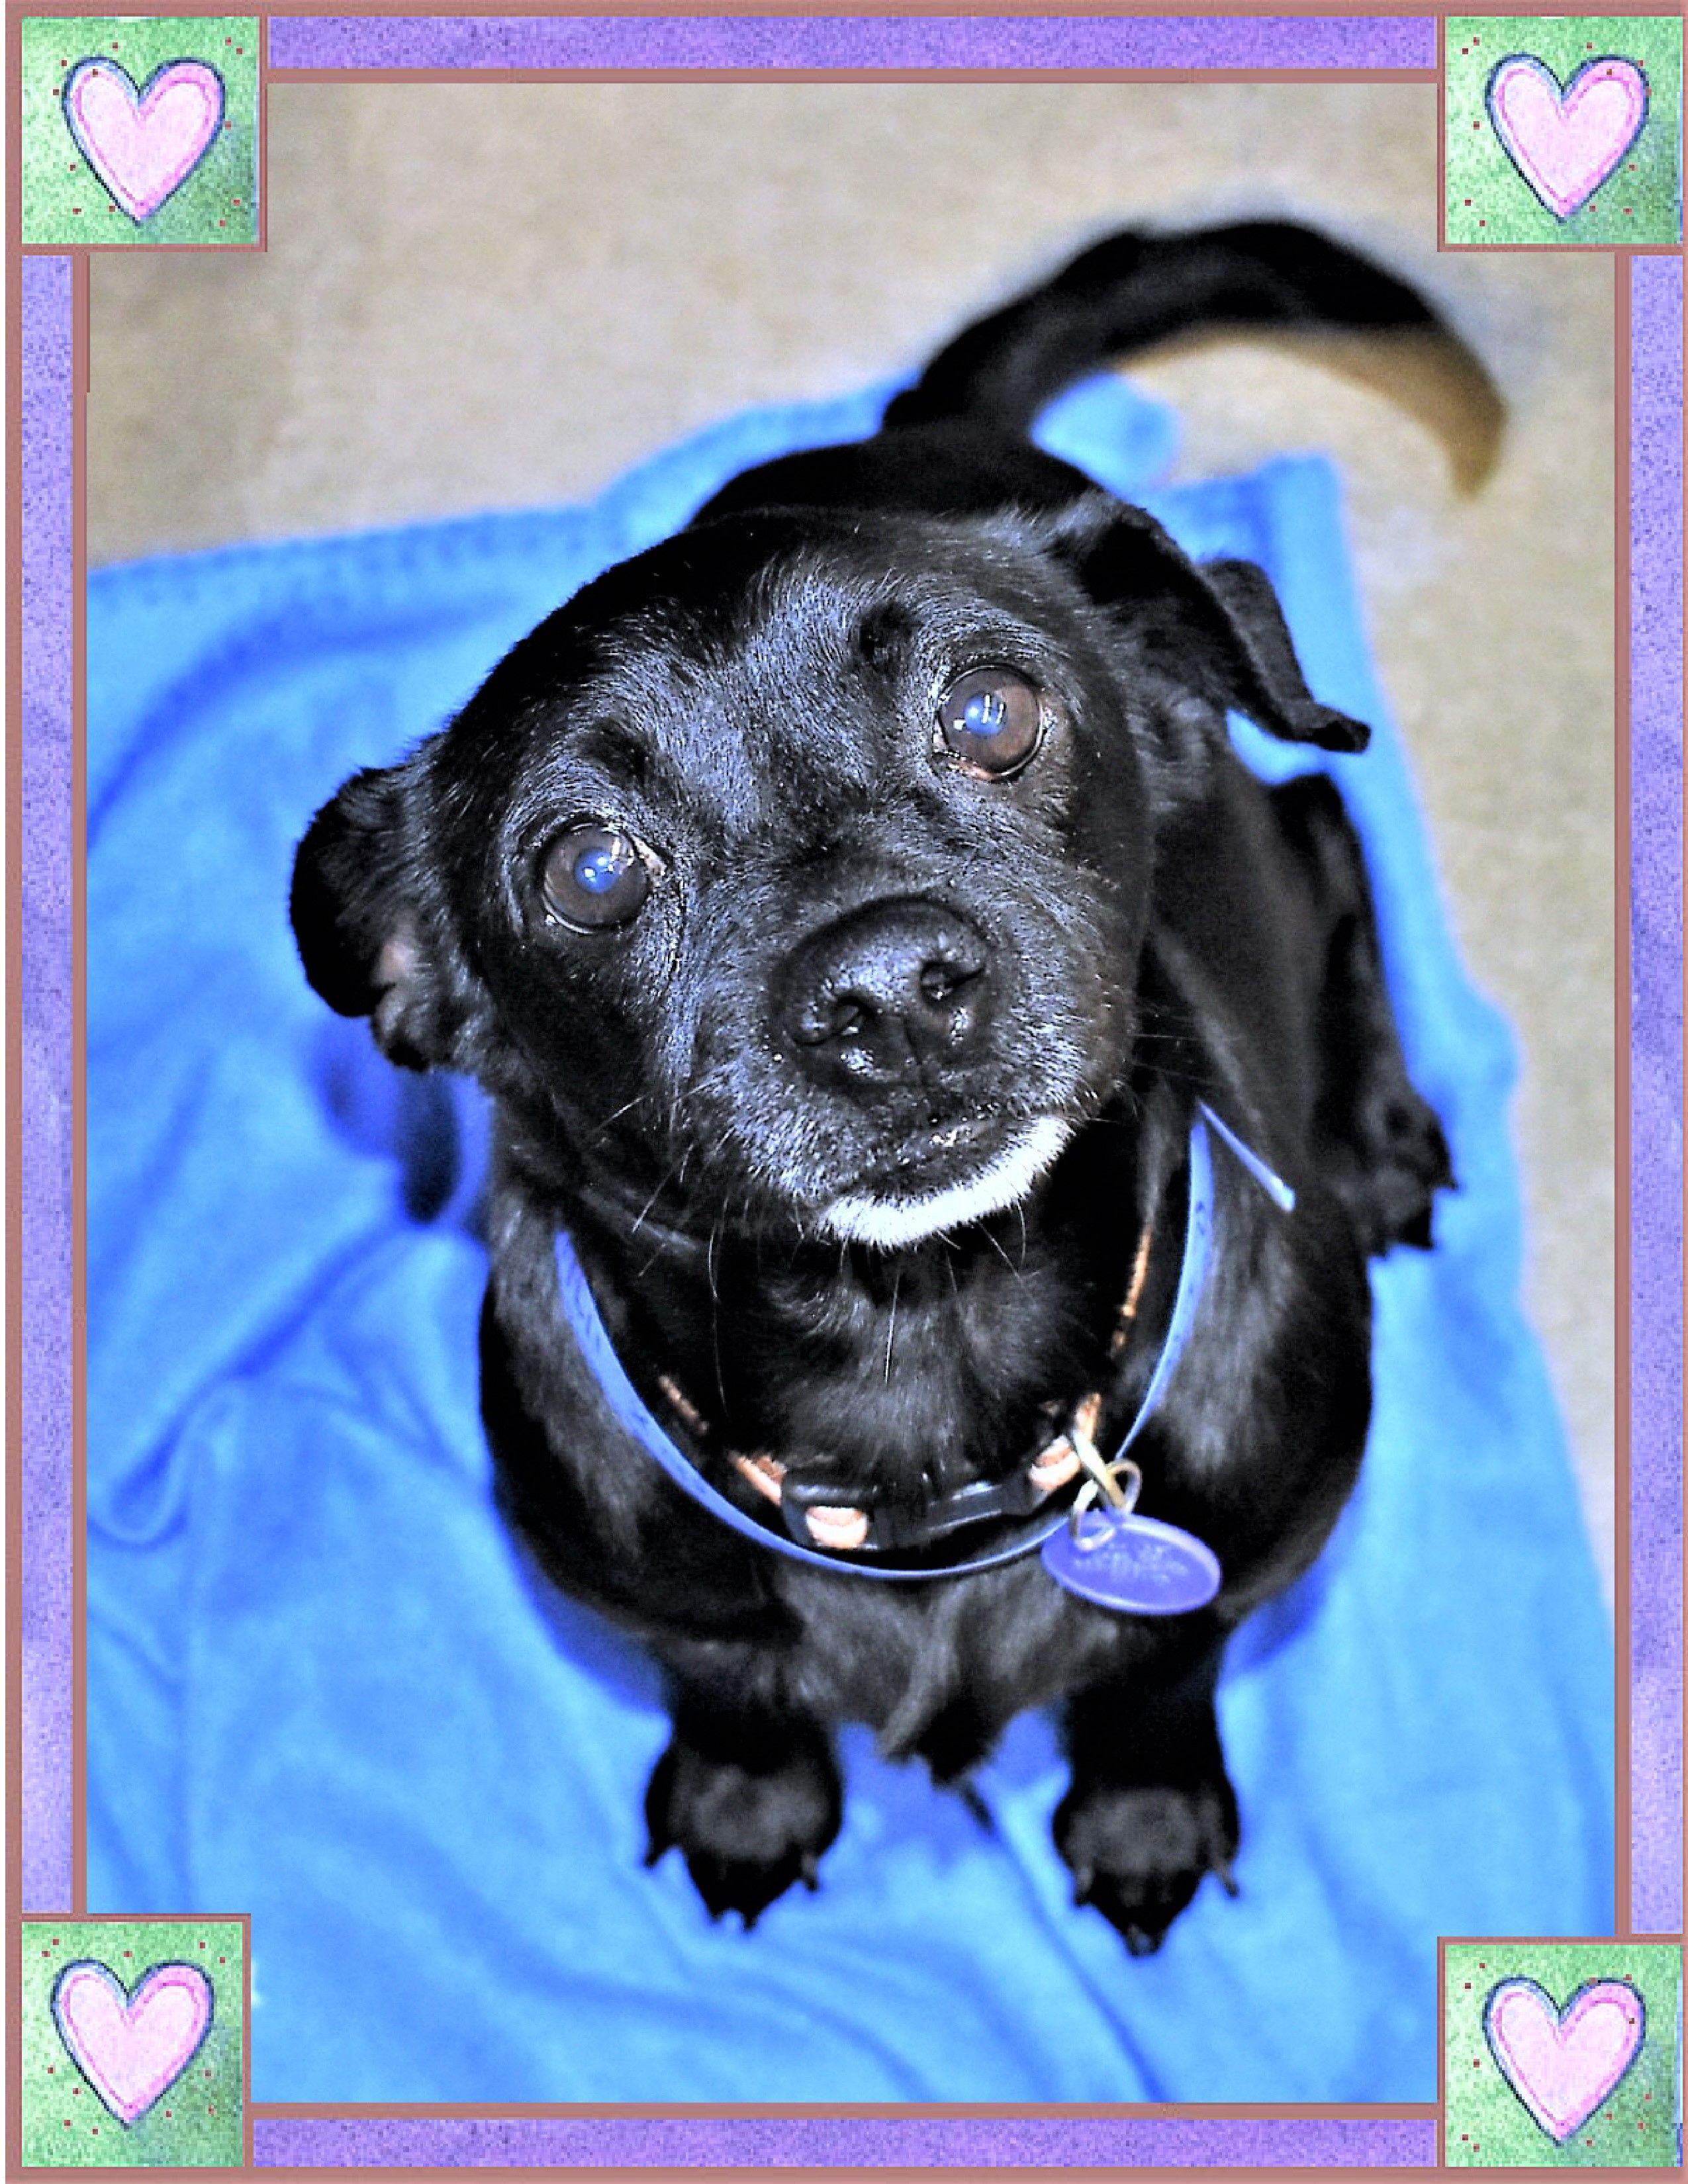 Chiweenie dog for Adoption in San Jacinto, CA. ADN764463